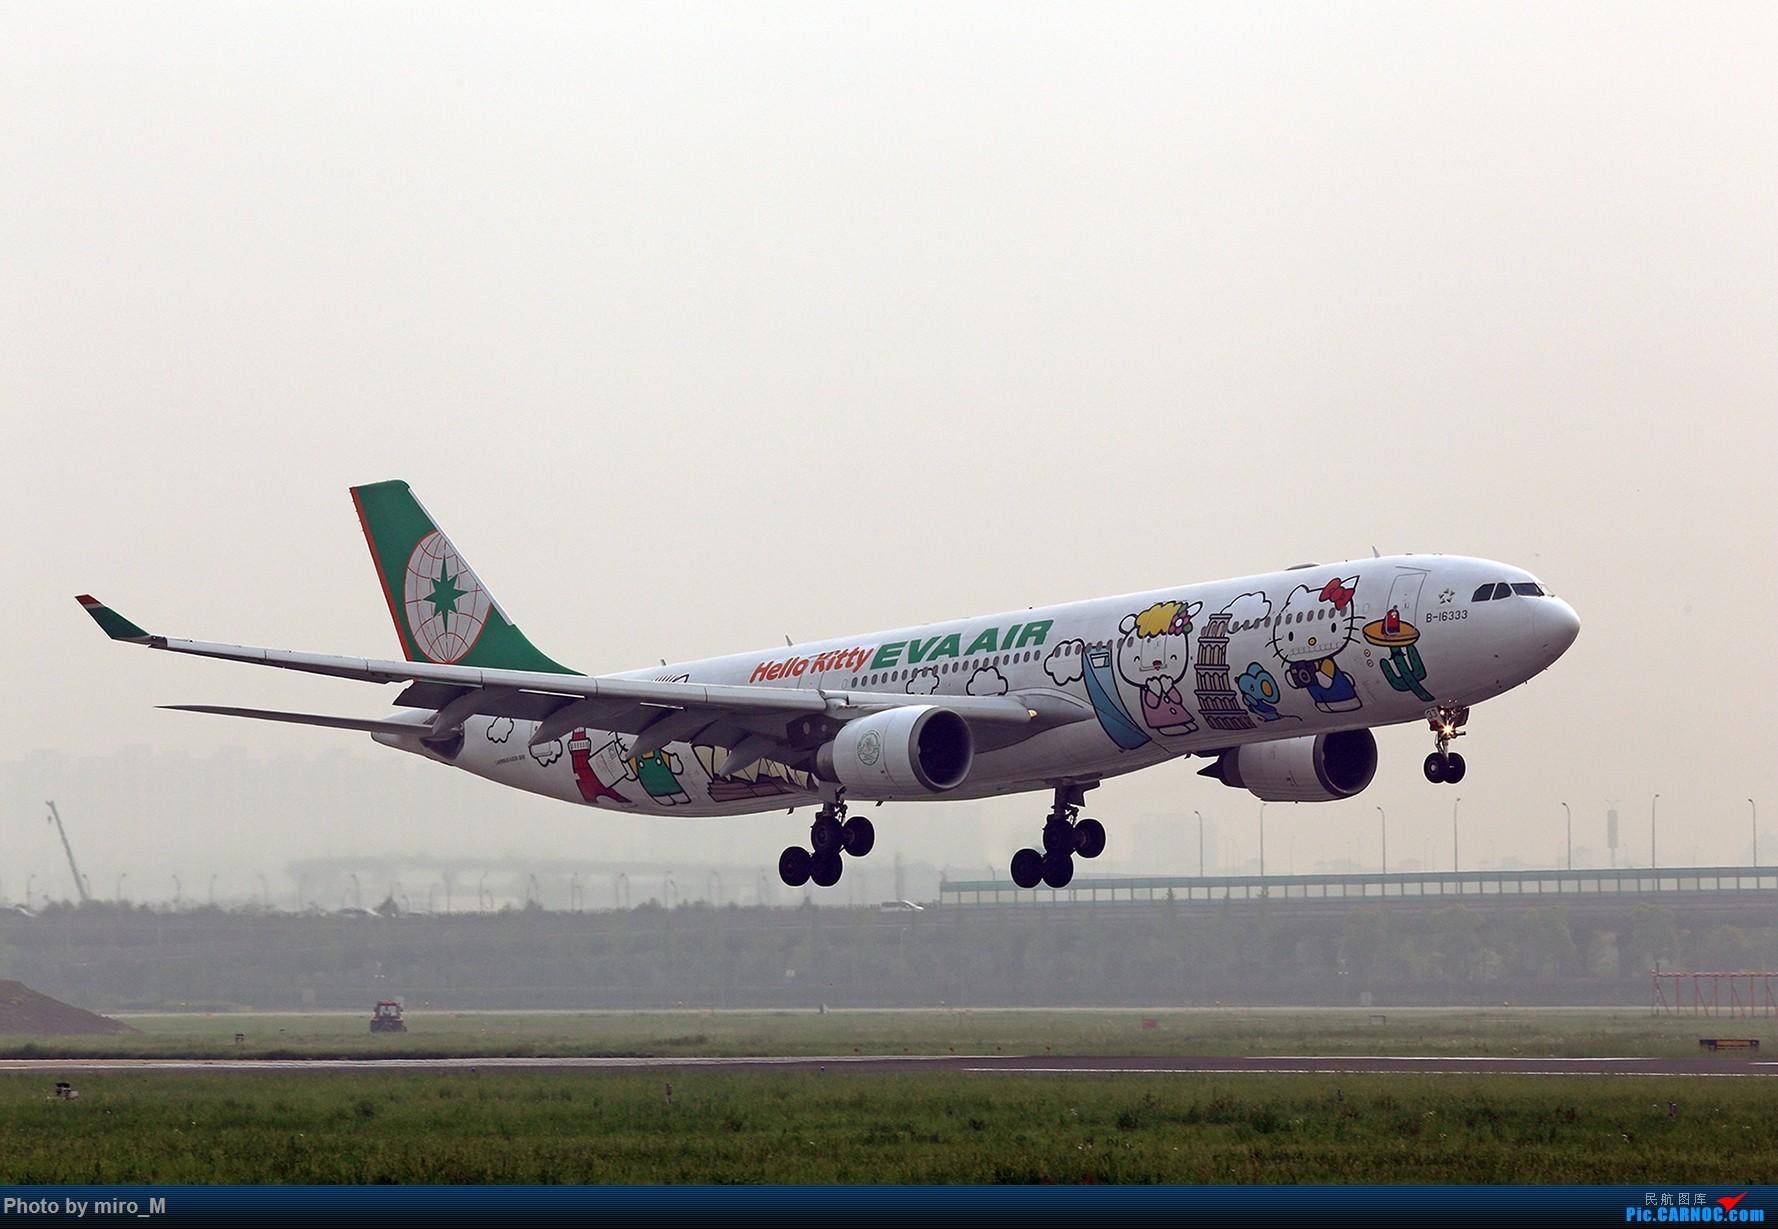 Re:[原创]烂天普通货………………虹桥412-414拍机合集 AIRBUS A330-300 B-16333 中国上海虹桥国际机场